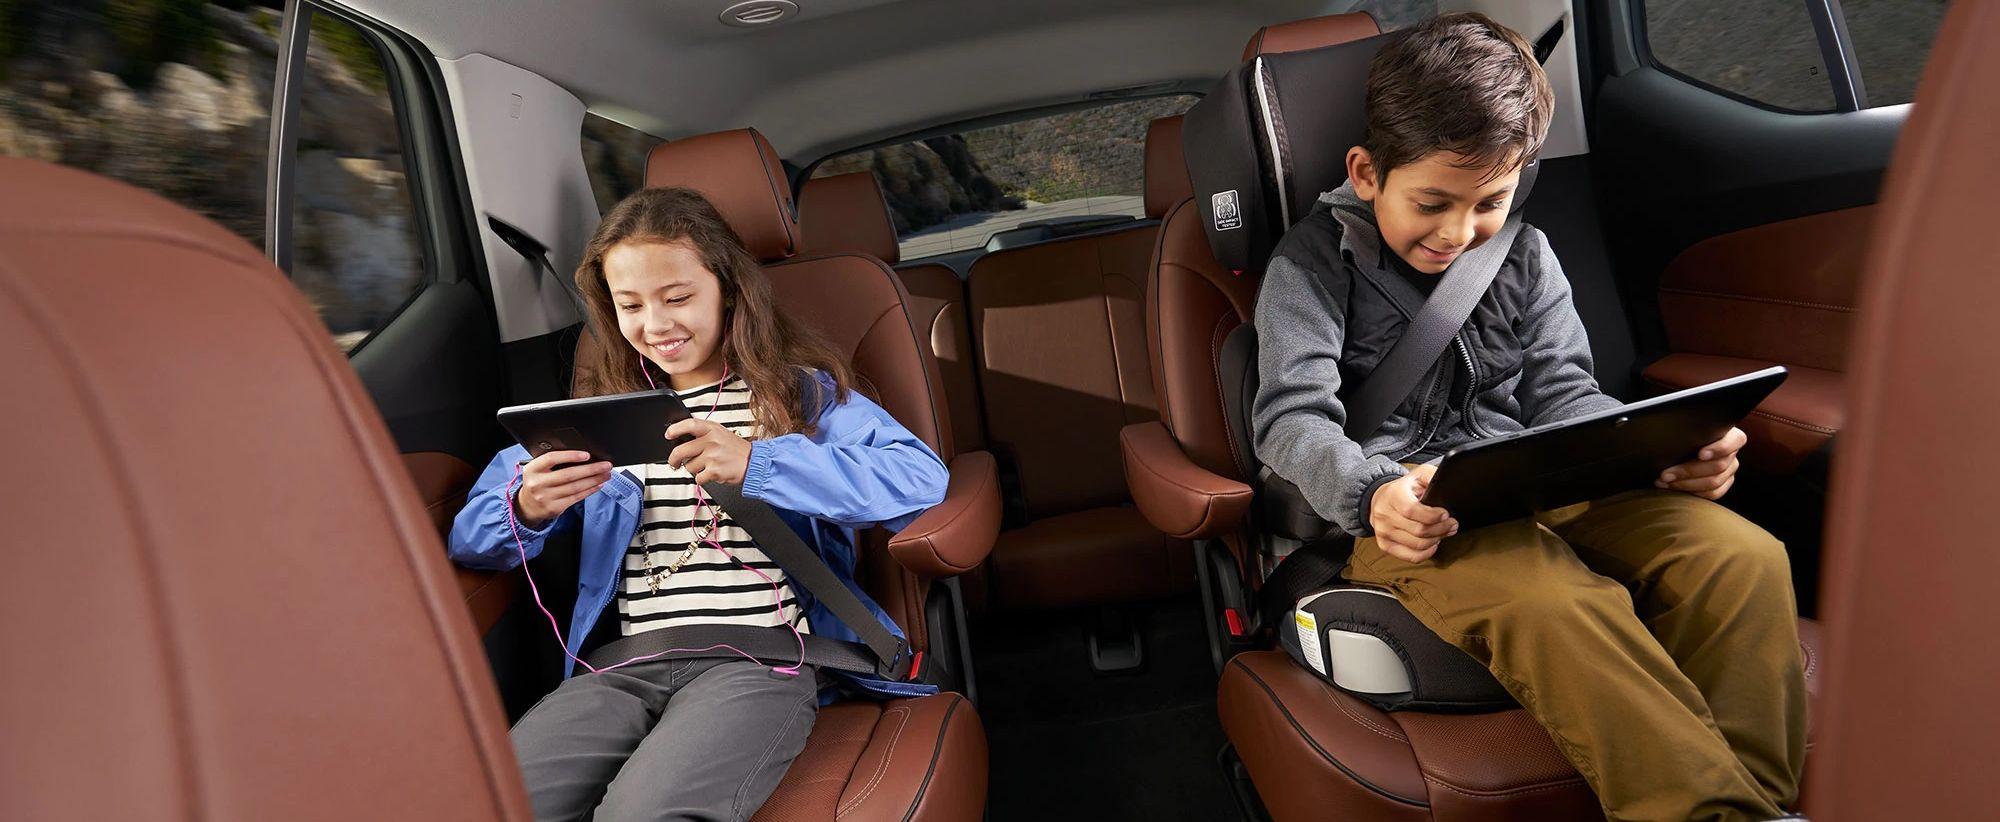 A tus pasajeros les va a encantar el punto de acceso Wi-Fi® 4G LTE opcional